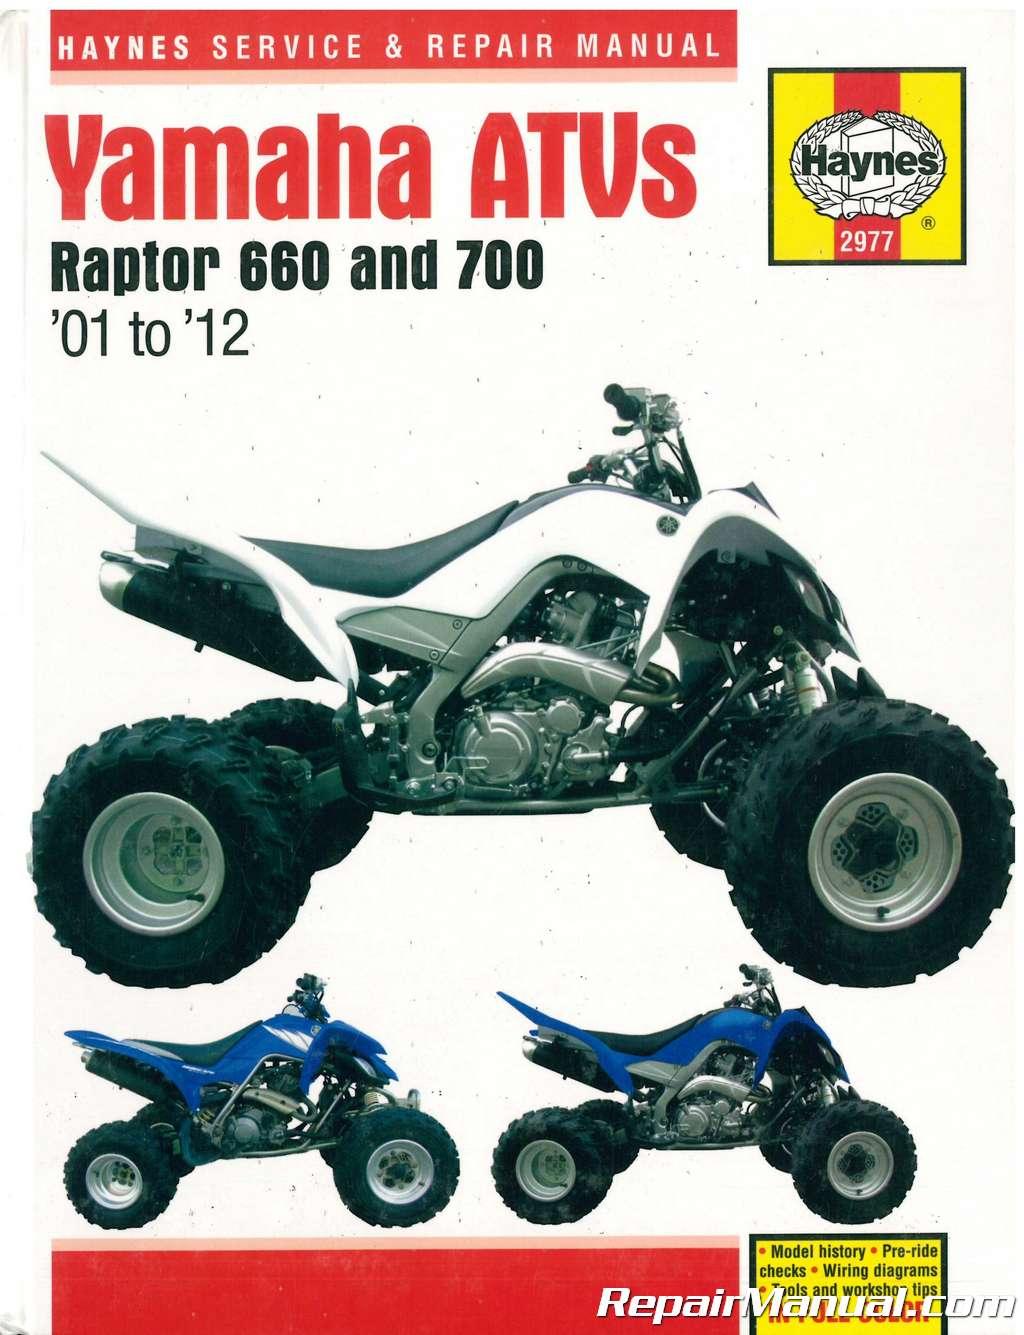 hight resolution of yamaha raptor 660 700 2001 2012 atv repair manual